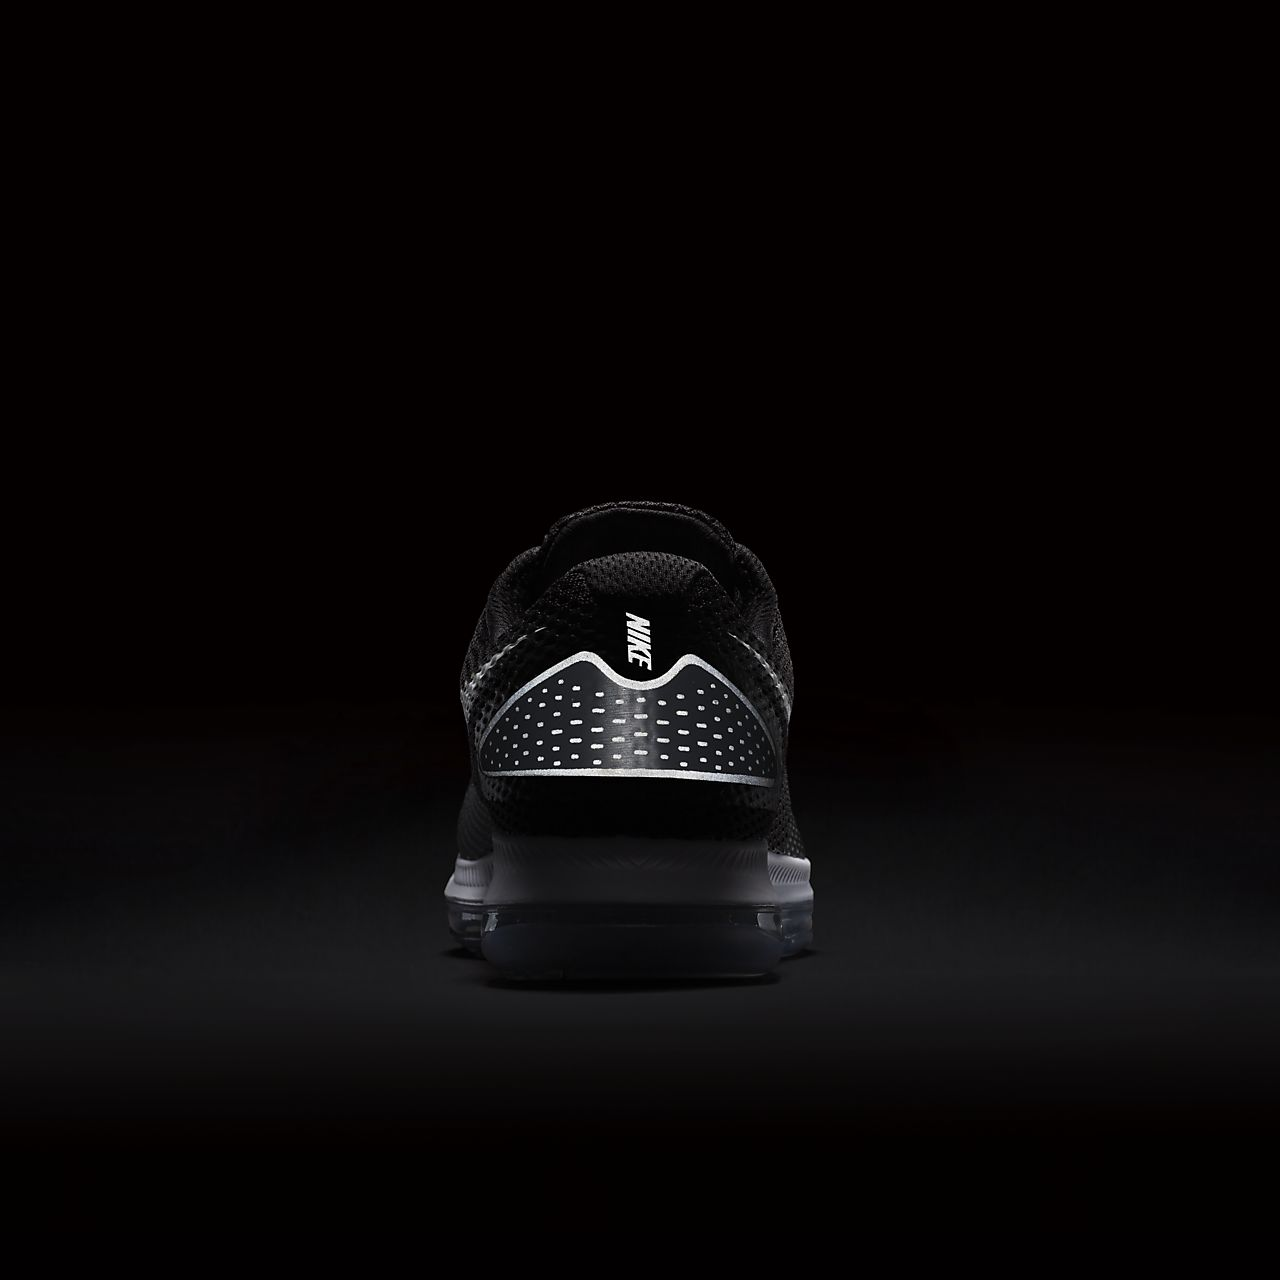 Nike Zoom All Out Low 2 Hardloopschoen voor dames